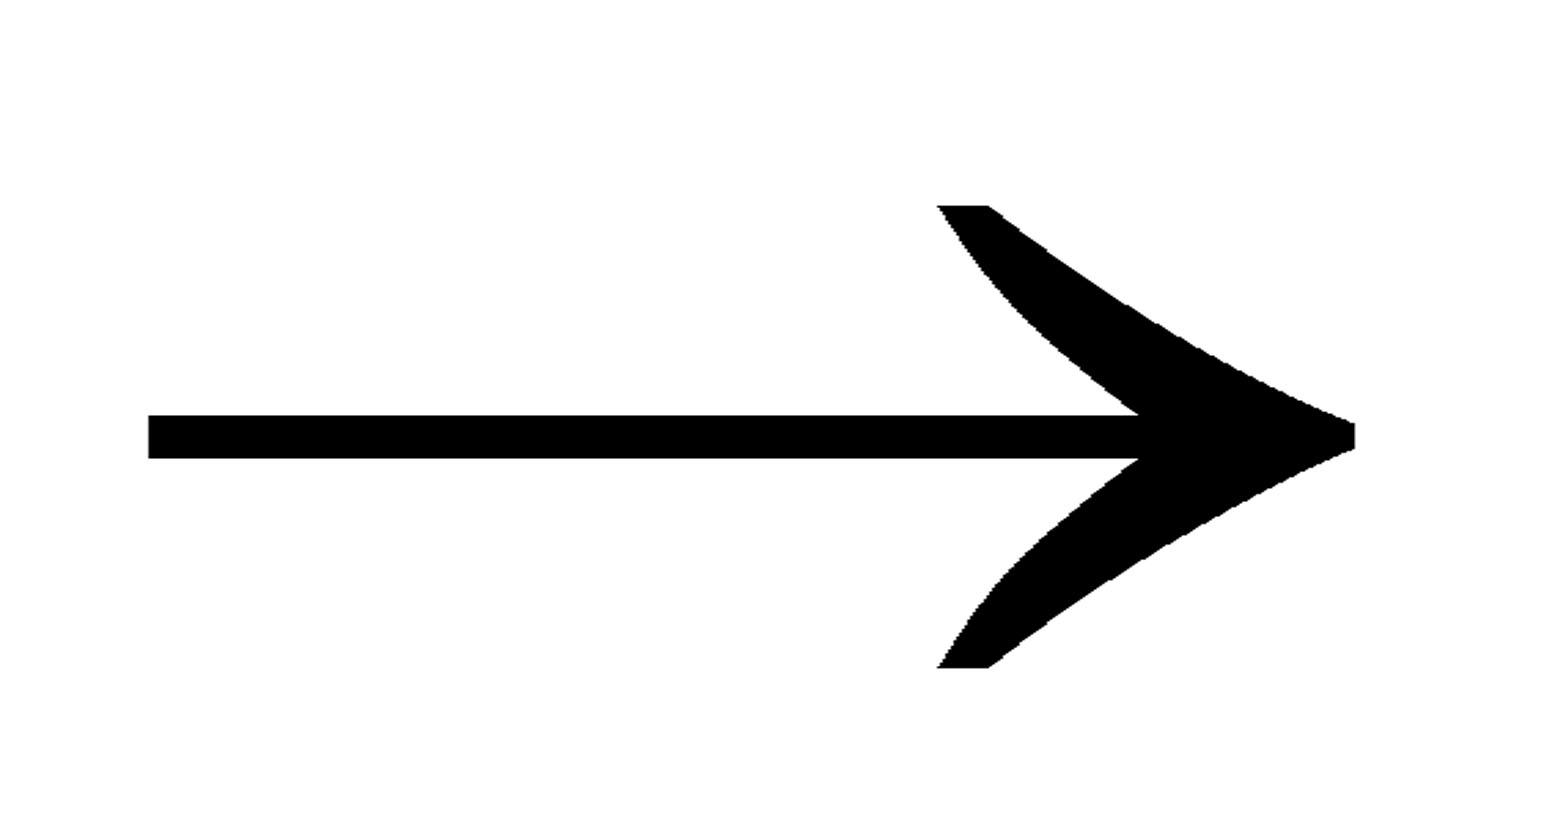 Black right arrow clipart clip art library download Black Arrow Clipart | Free download best Black Arrow Clipart on ... clip art library download